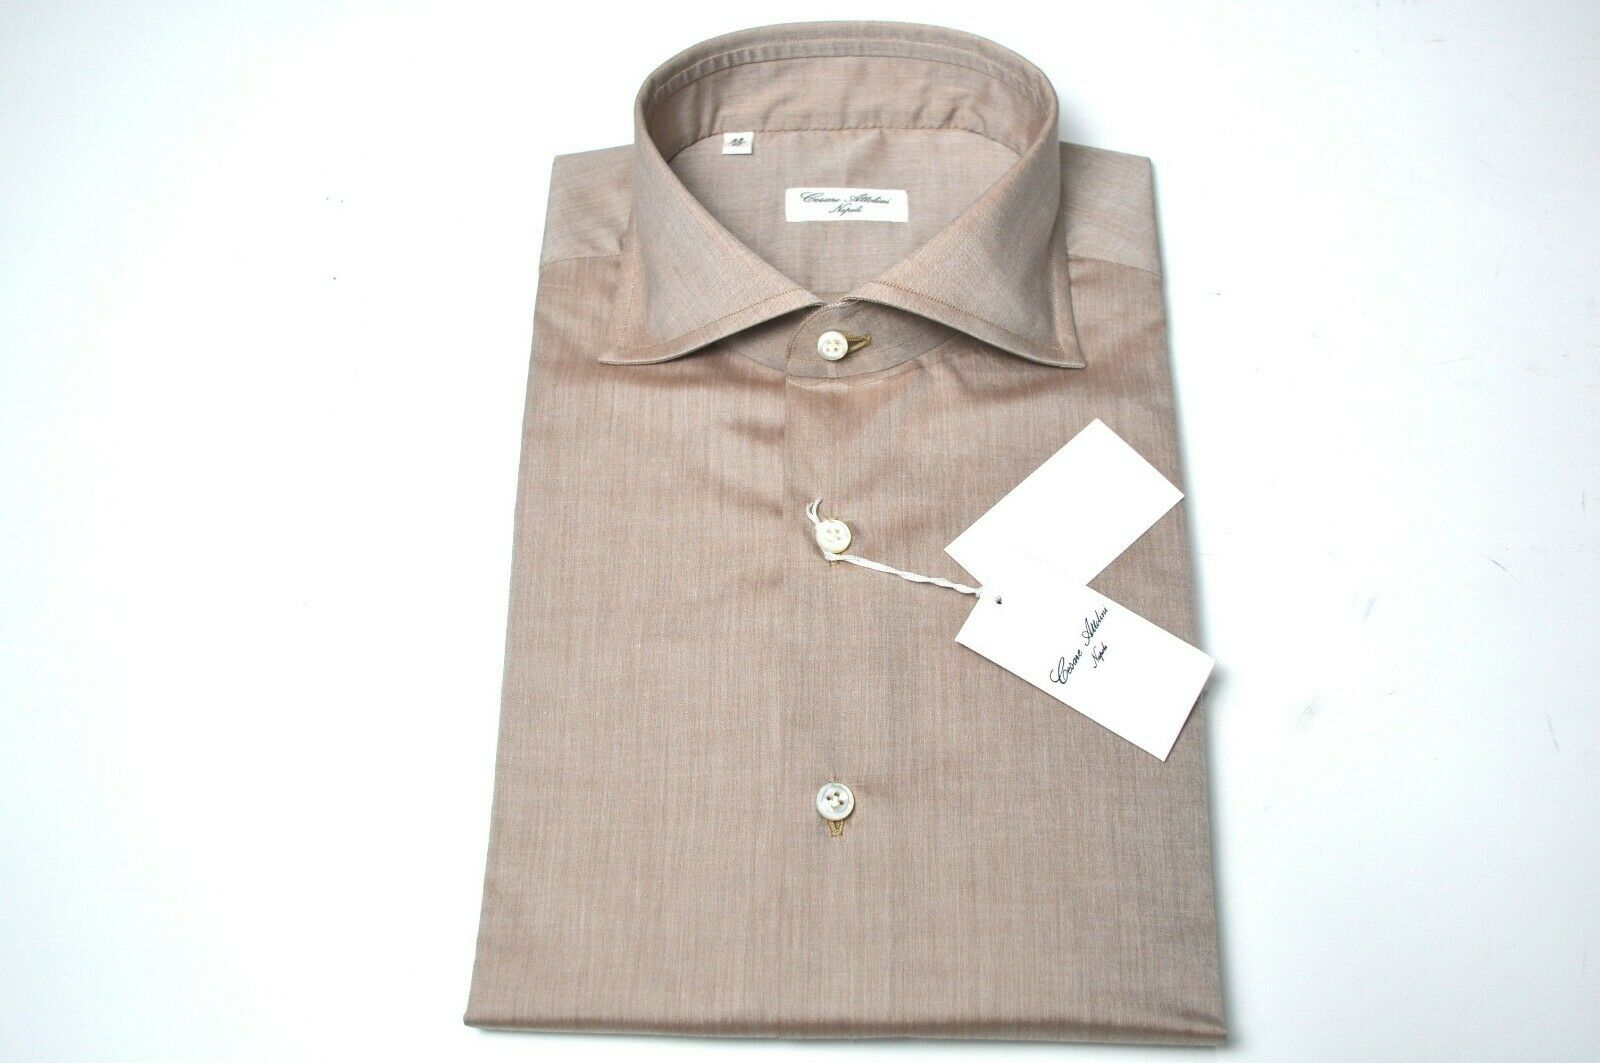 NEW CESARE ATTOLINI  Dress hemd  Größe 17 Us 43 Eu (Cod AT1)